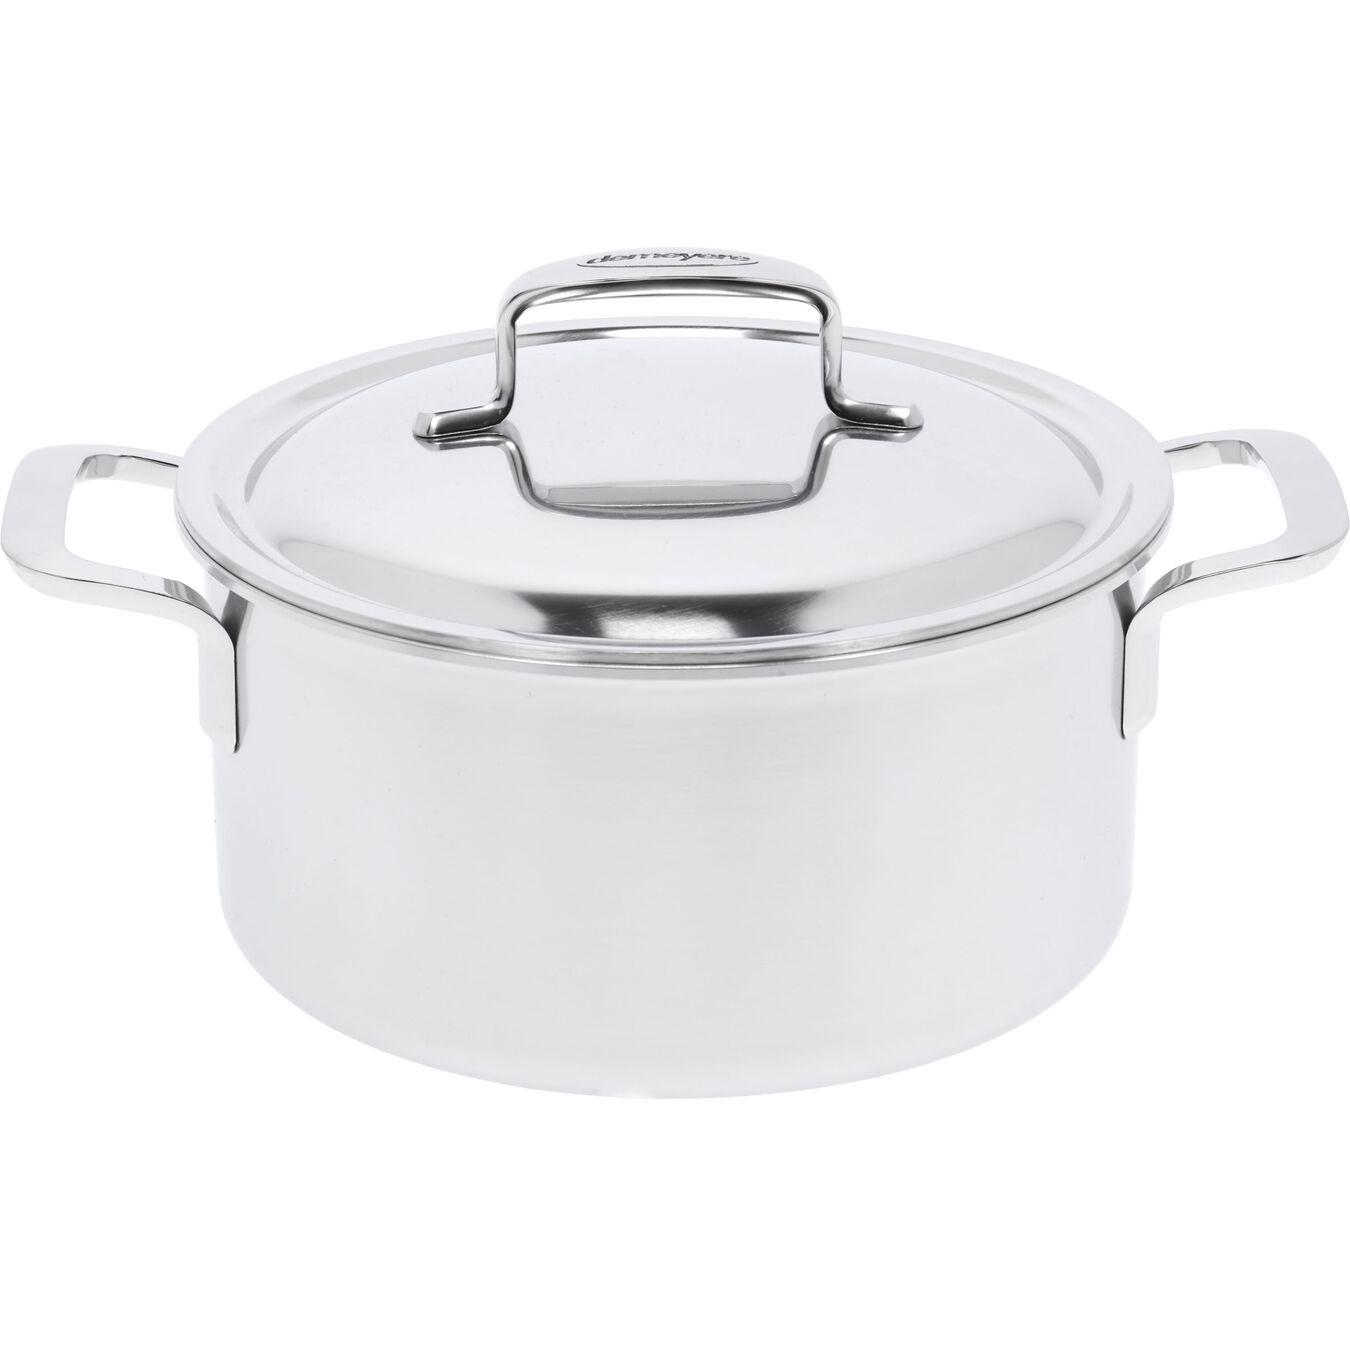 Kookpot met dubbelwandig deksel, 22 cm / 4 l,,large 1